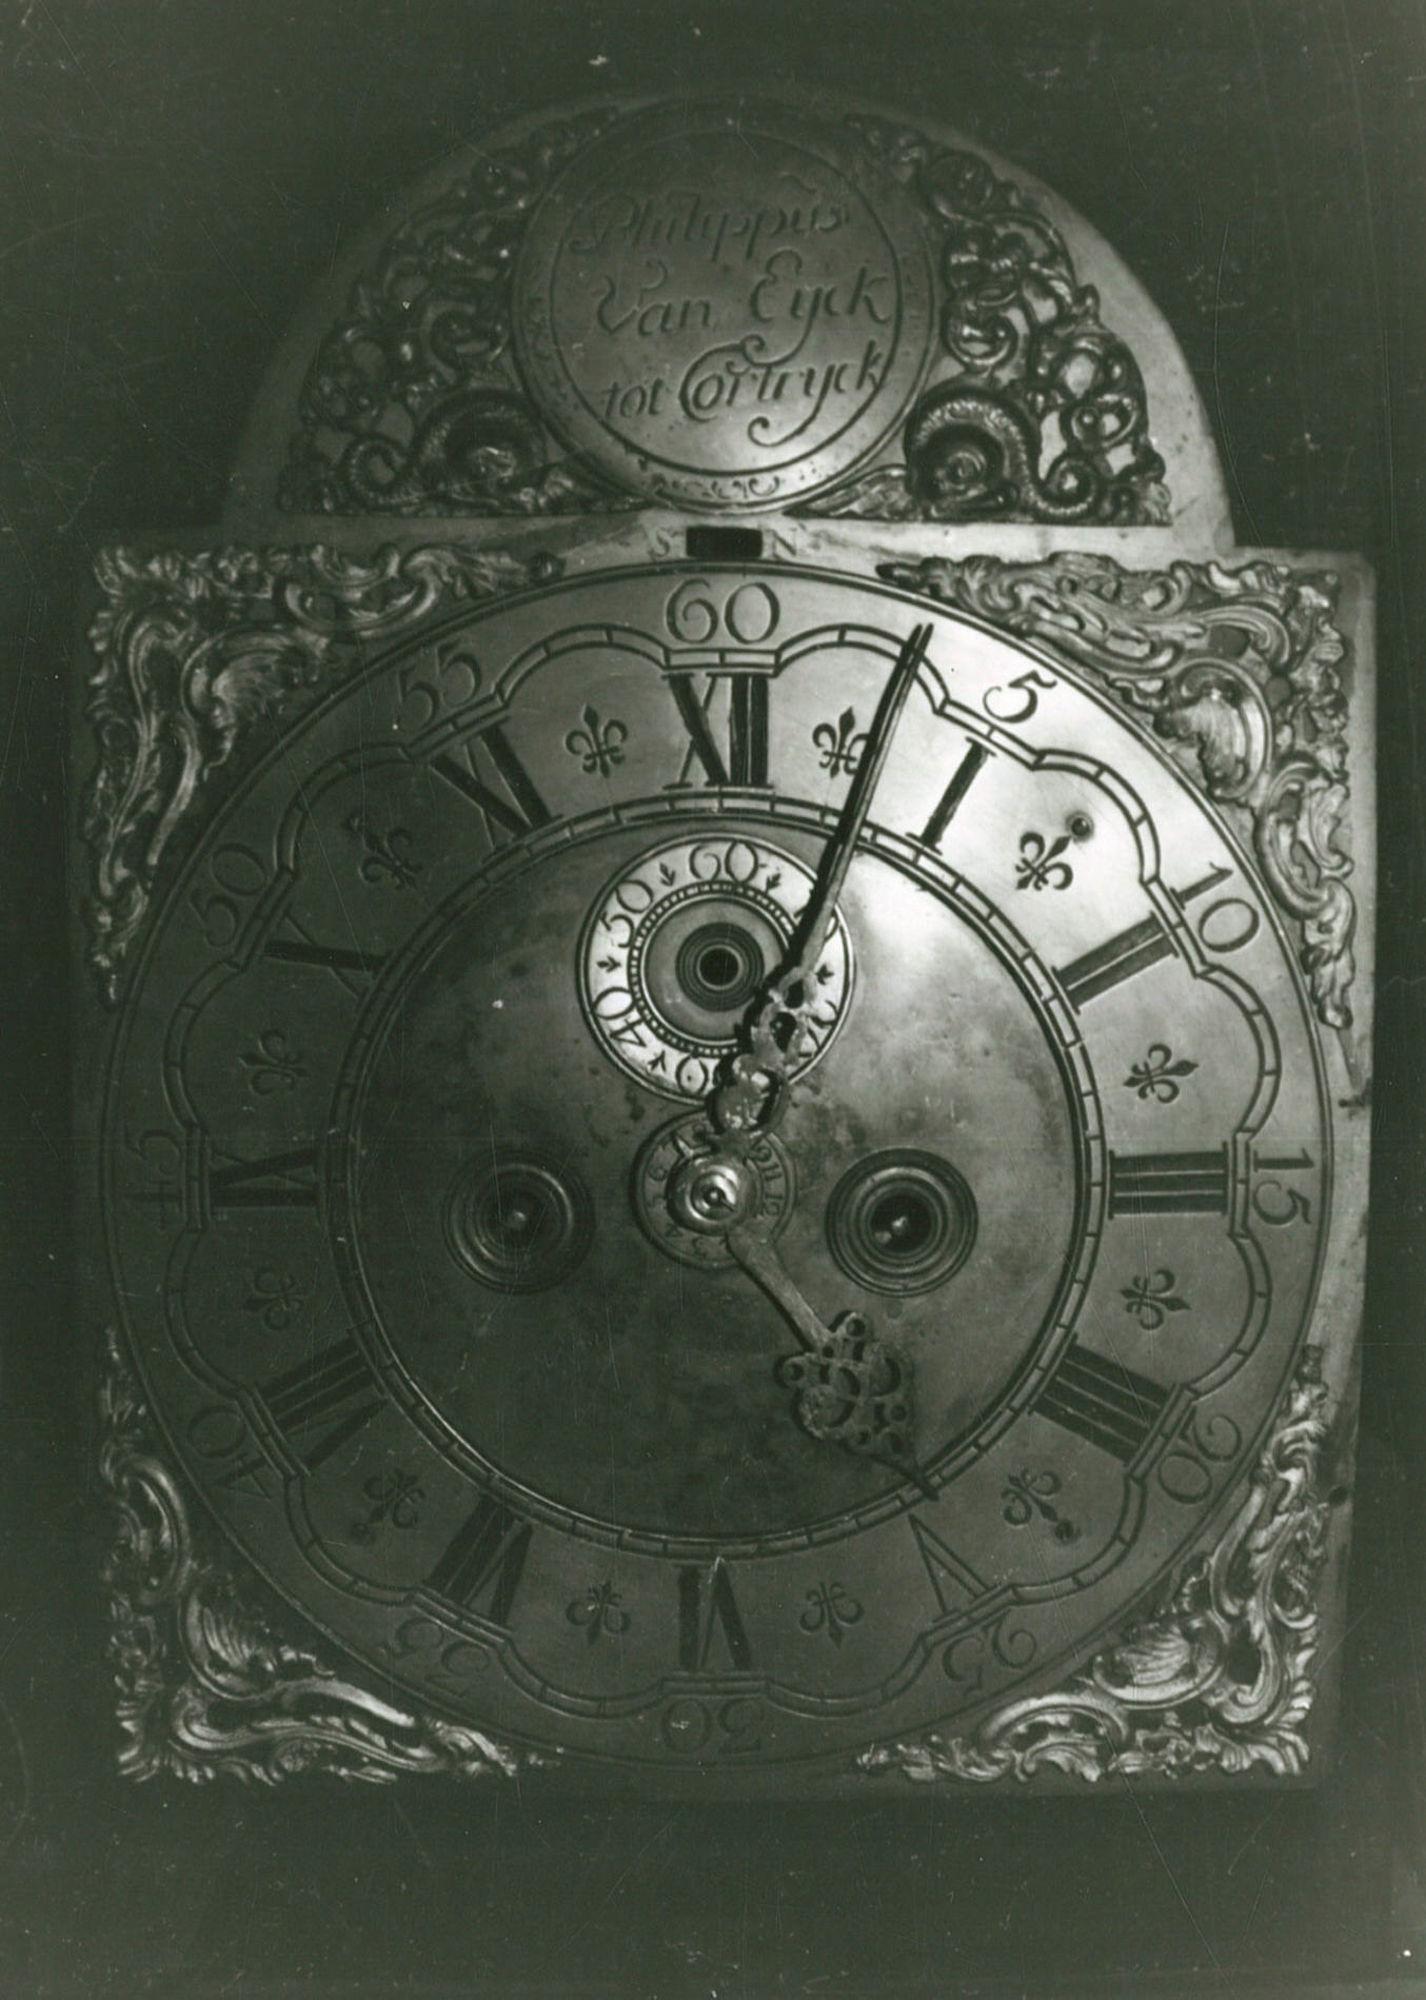 Staande klok Philippe Van Eyck